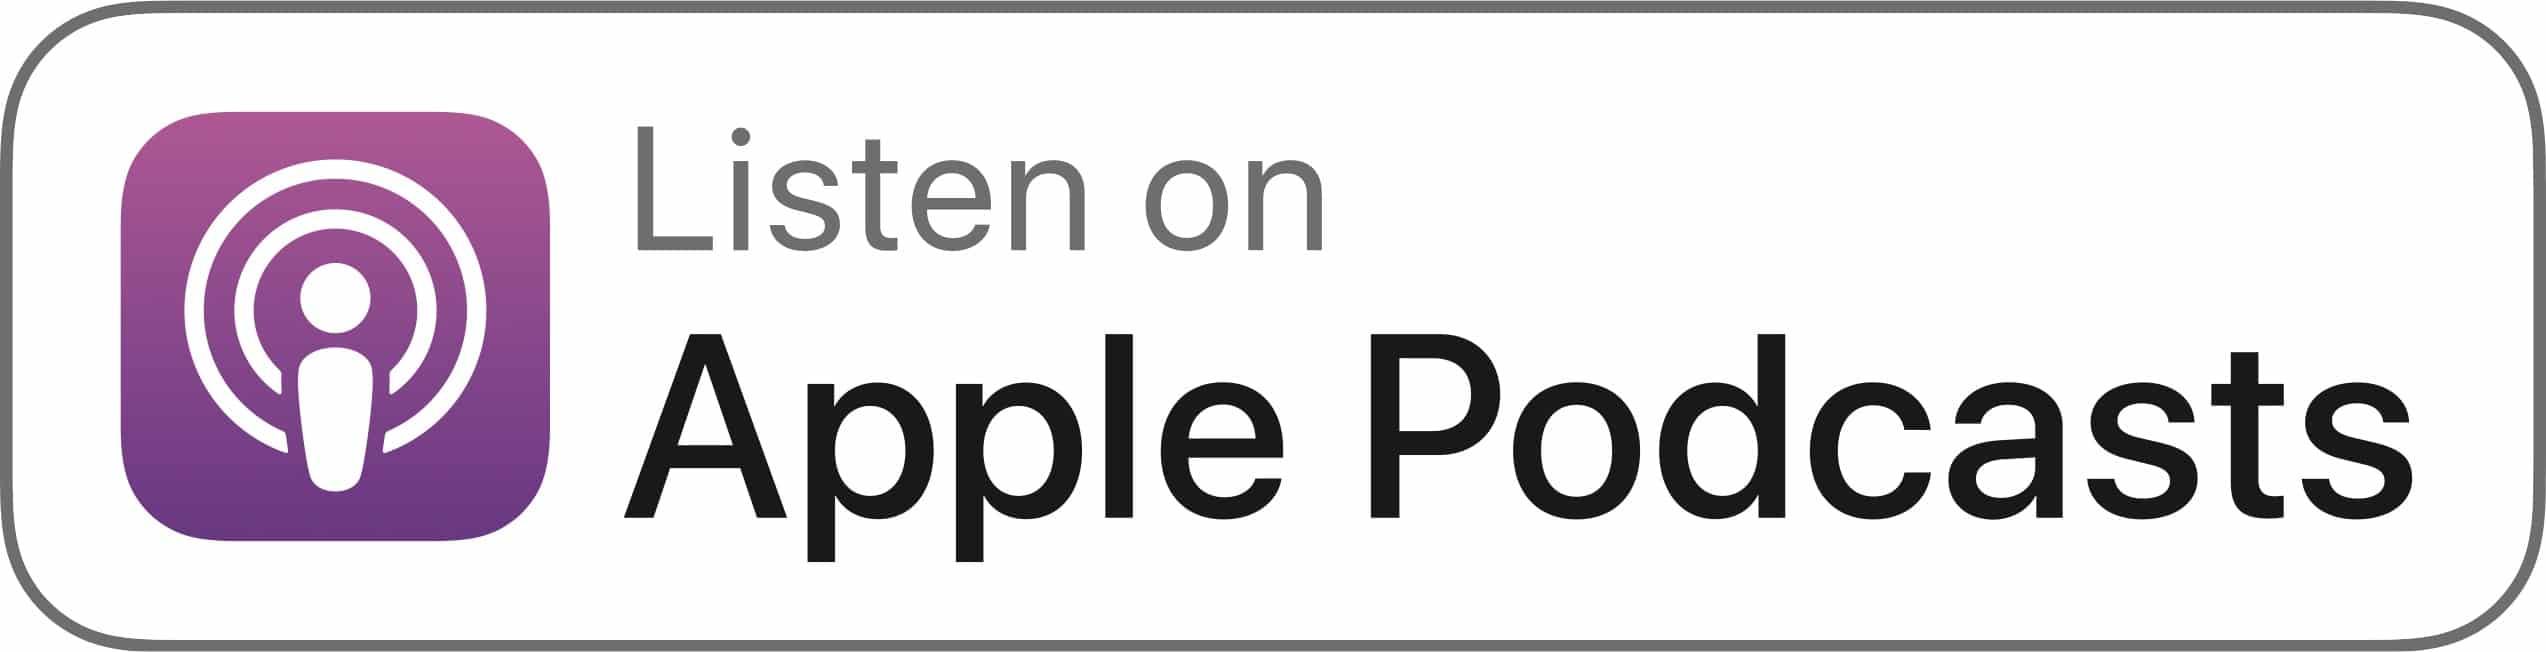 Apple Podcasts_Logo